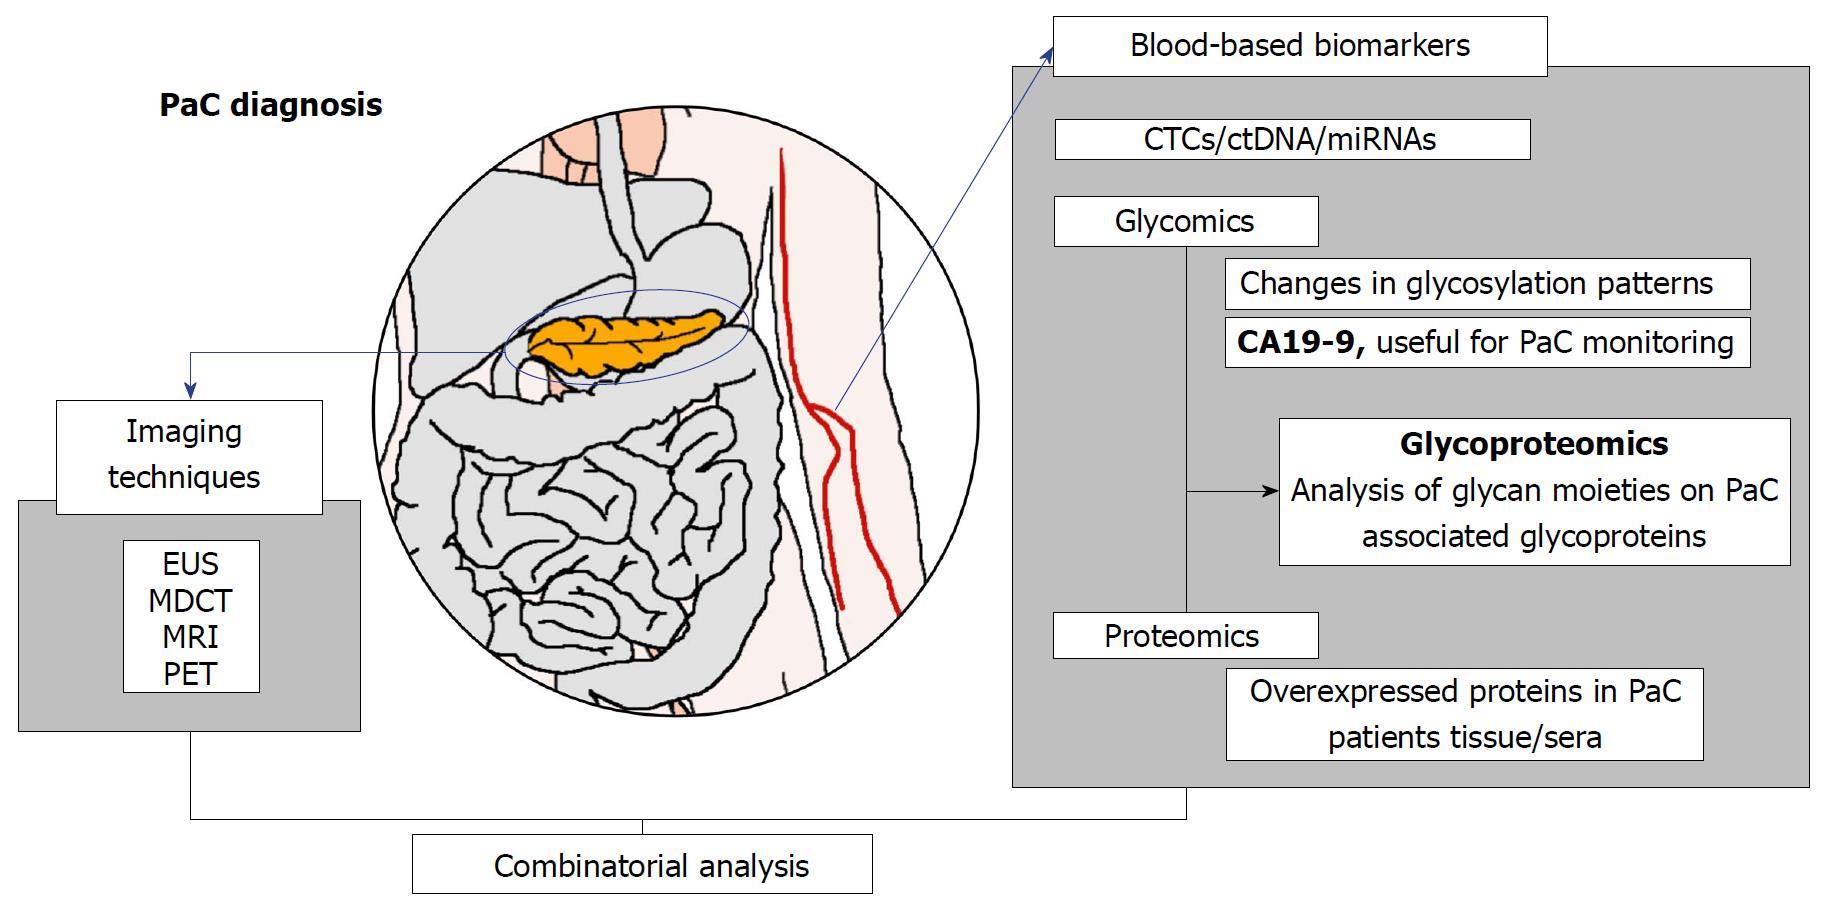 Pancreatic cancer biomarkers, Ana-Maria Enciu - Referințe bibliografice Google Academic